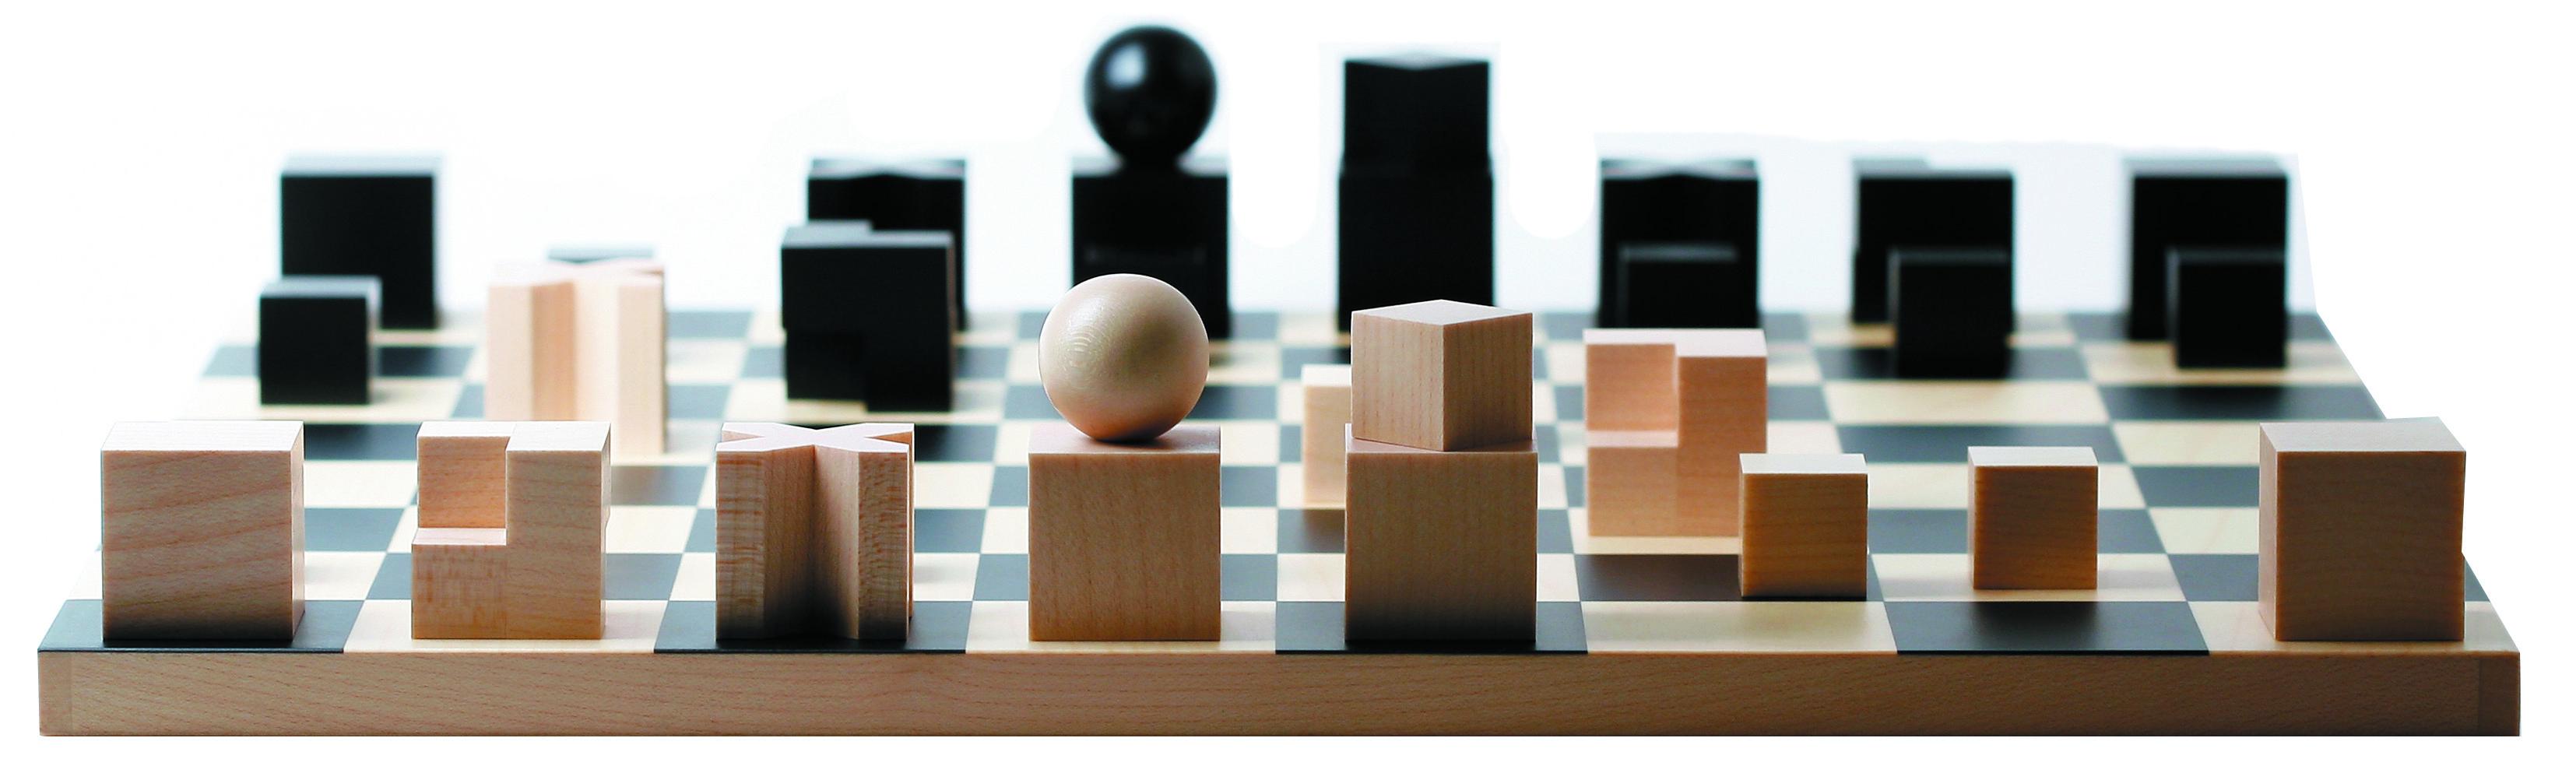 Naef bauhaus chess set naef toys pinterest chess sets - Bauhaus chess board ...